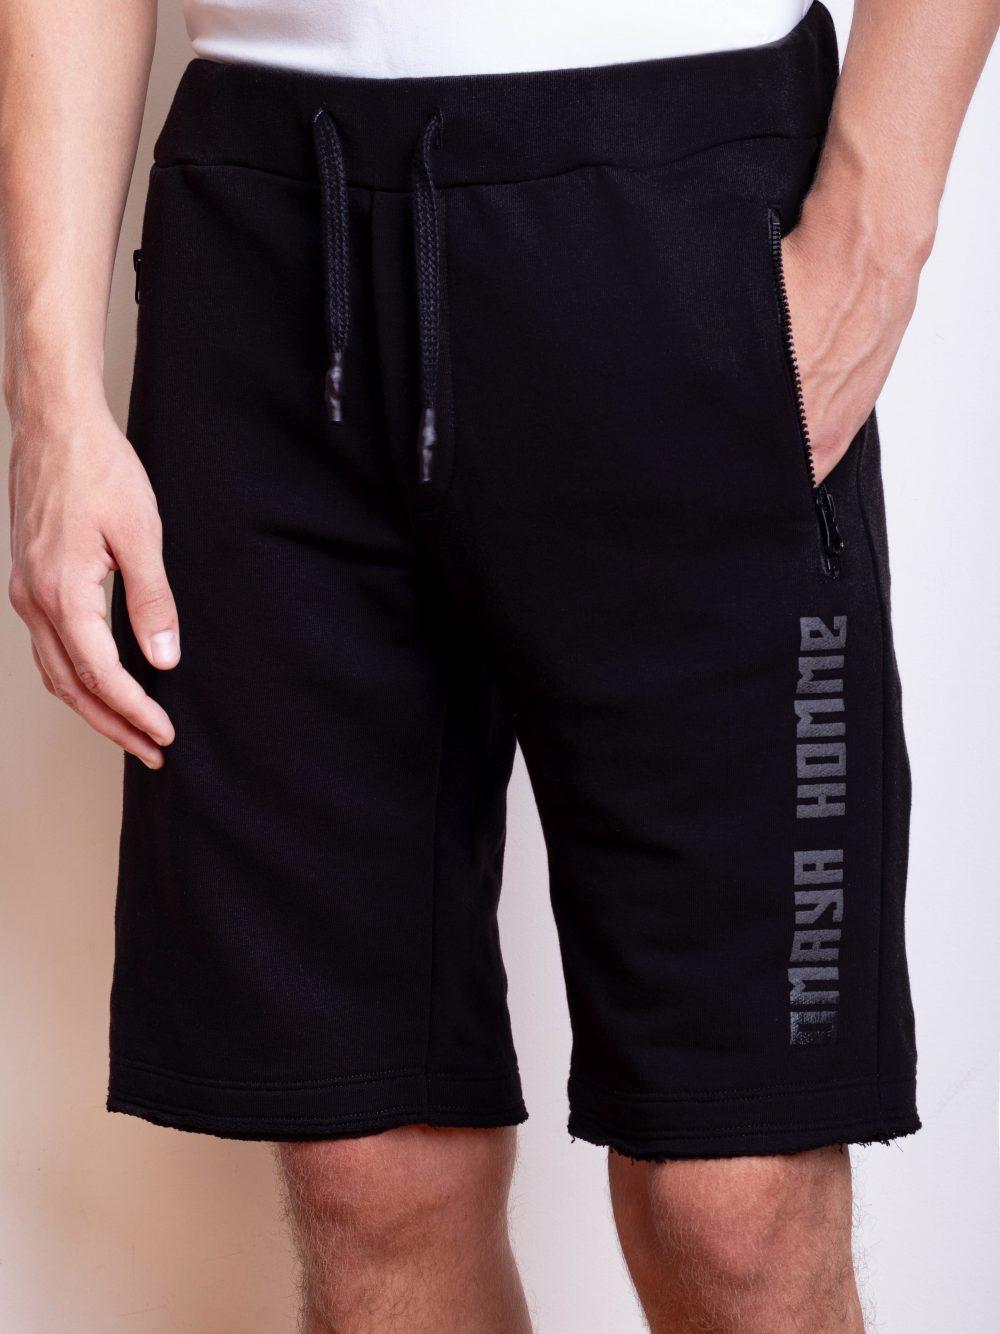 black shorts with zipped pockets